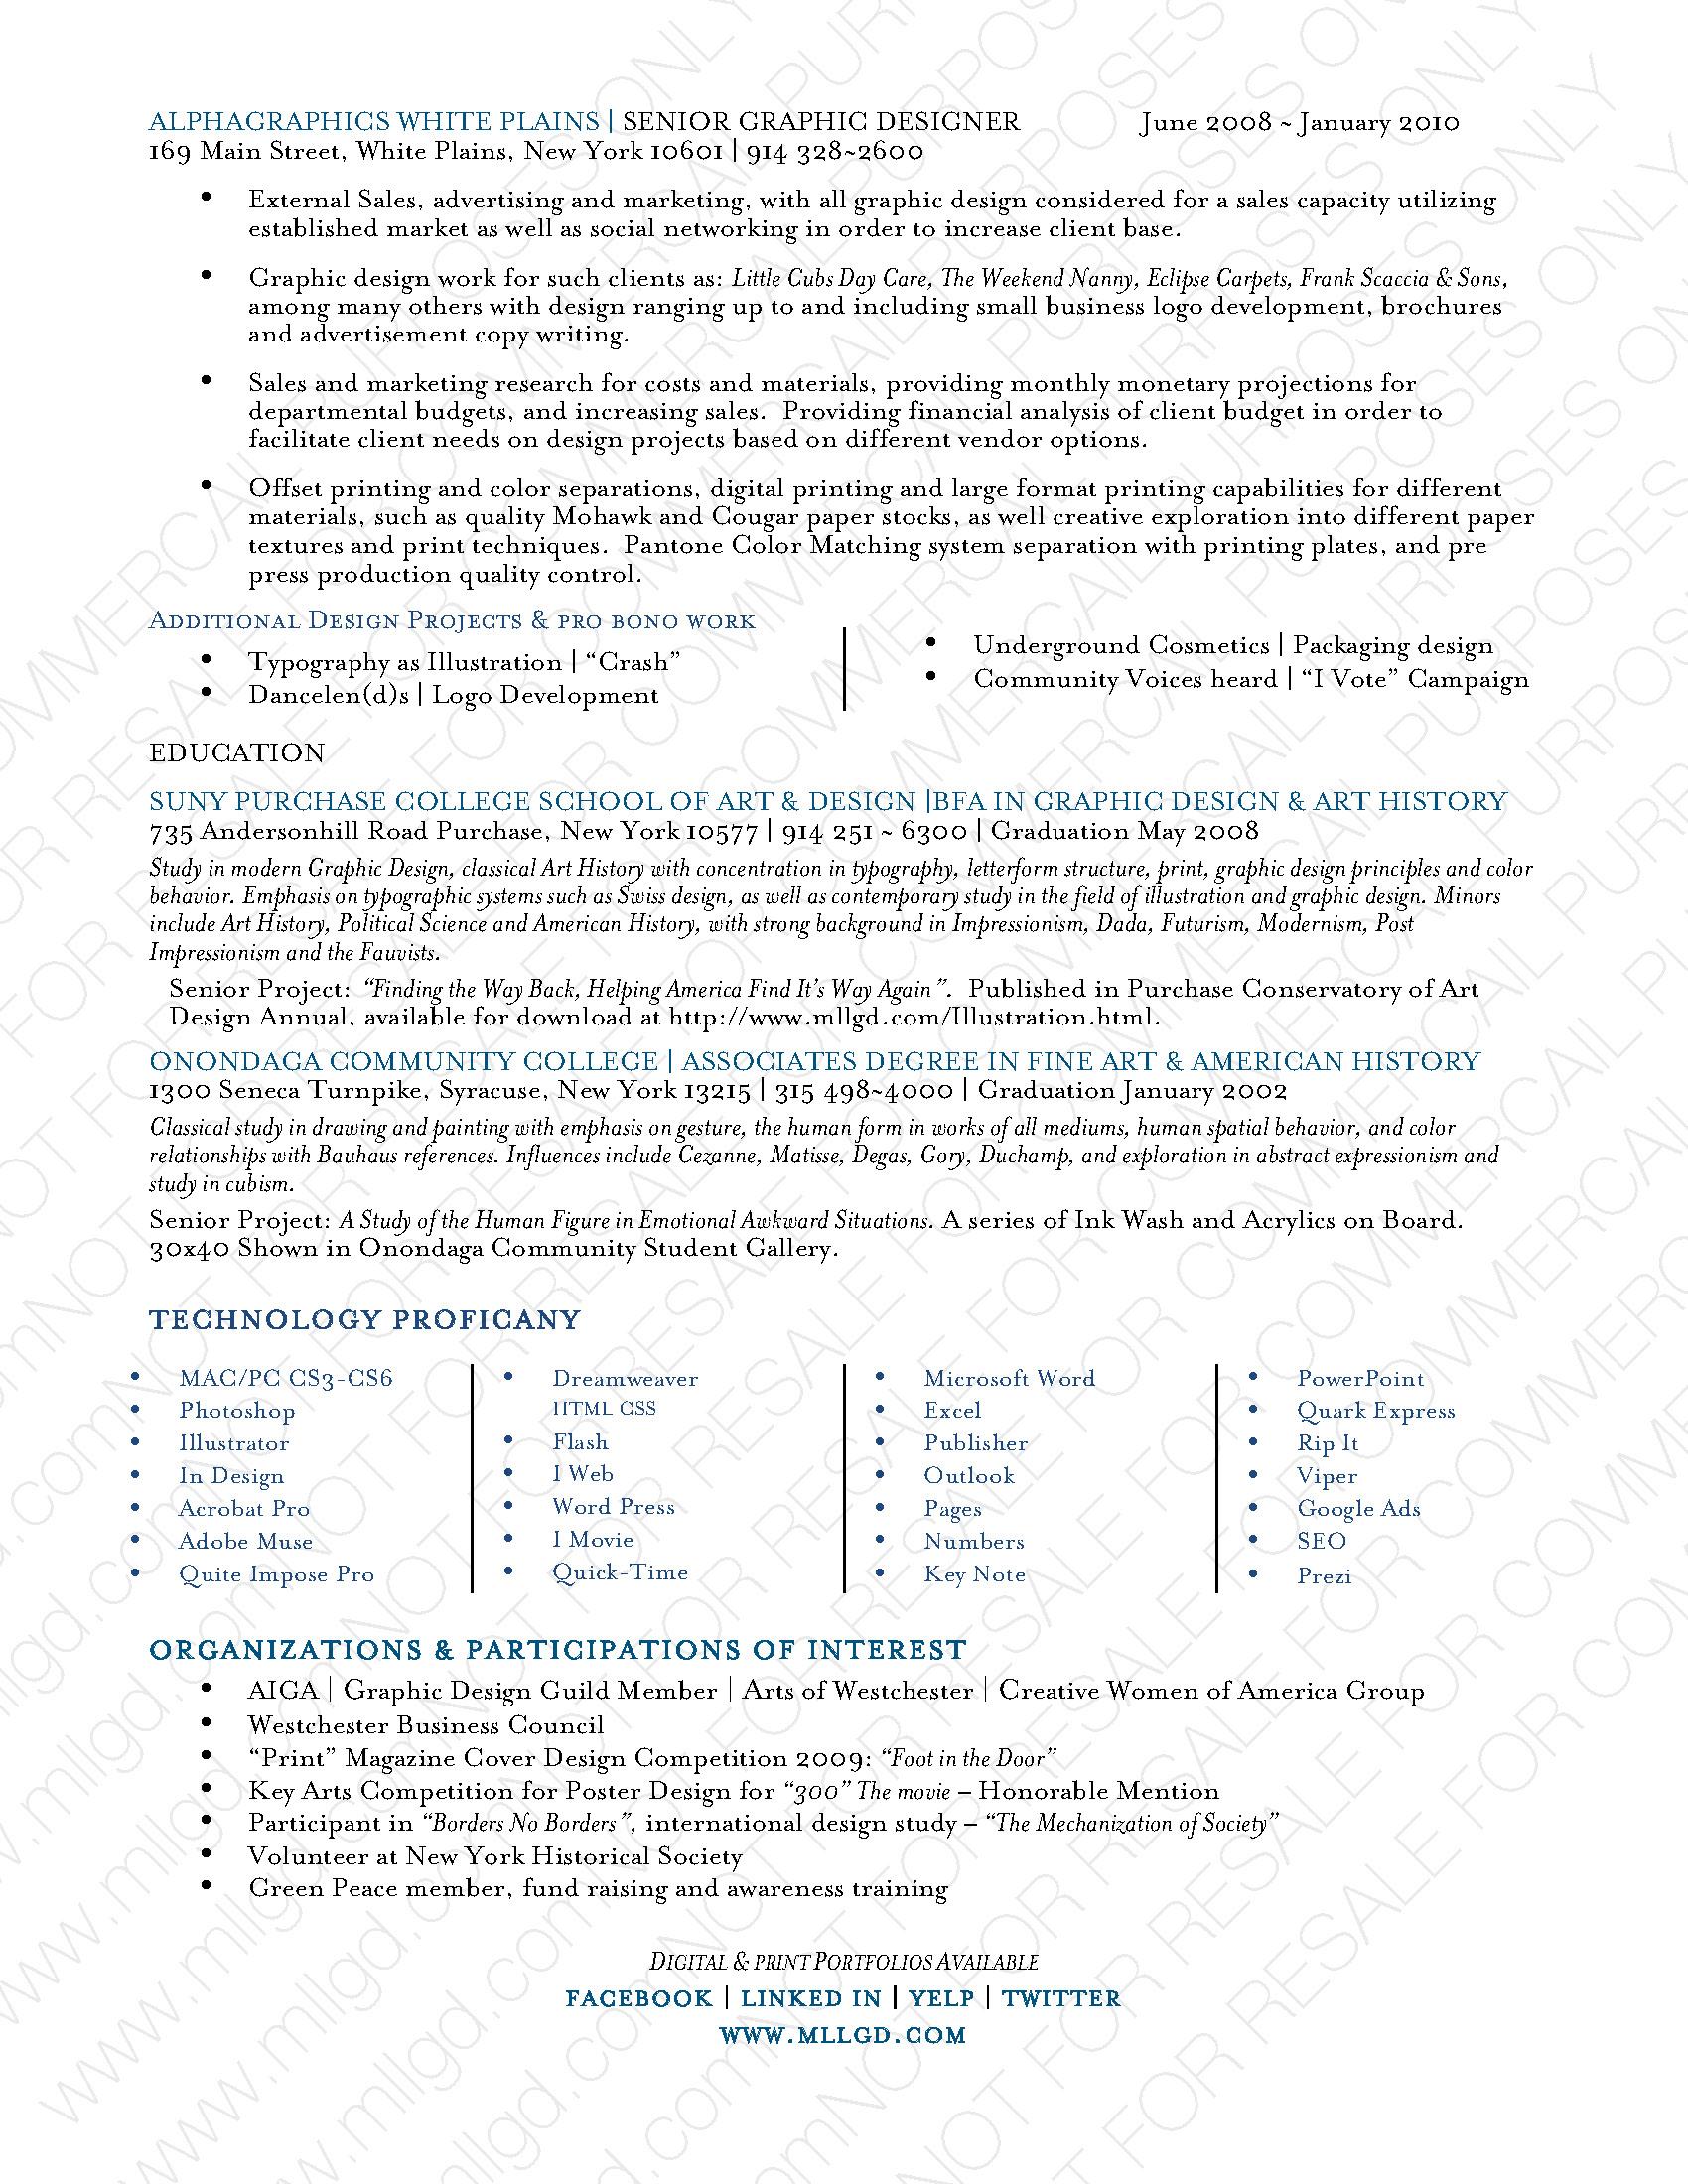 MLL_Resume_Design_2014_Page_44.jpg